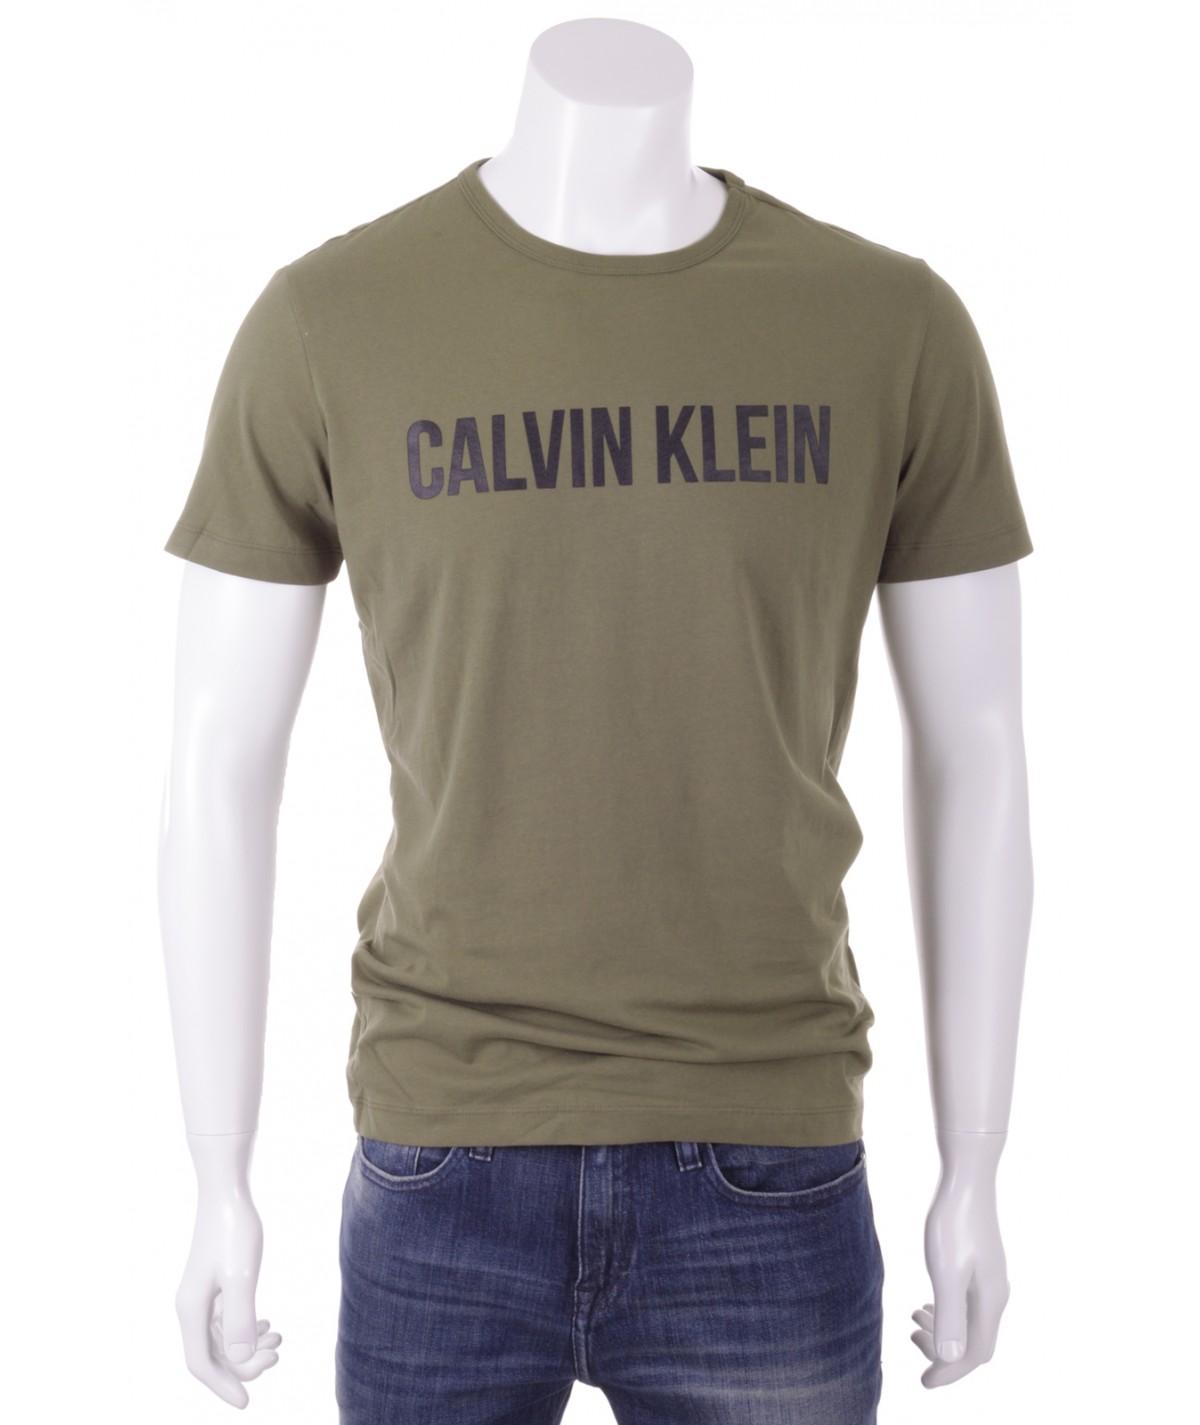 CALVIN KLEIN T-Shirt Uomo